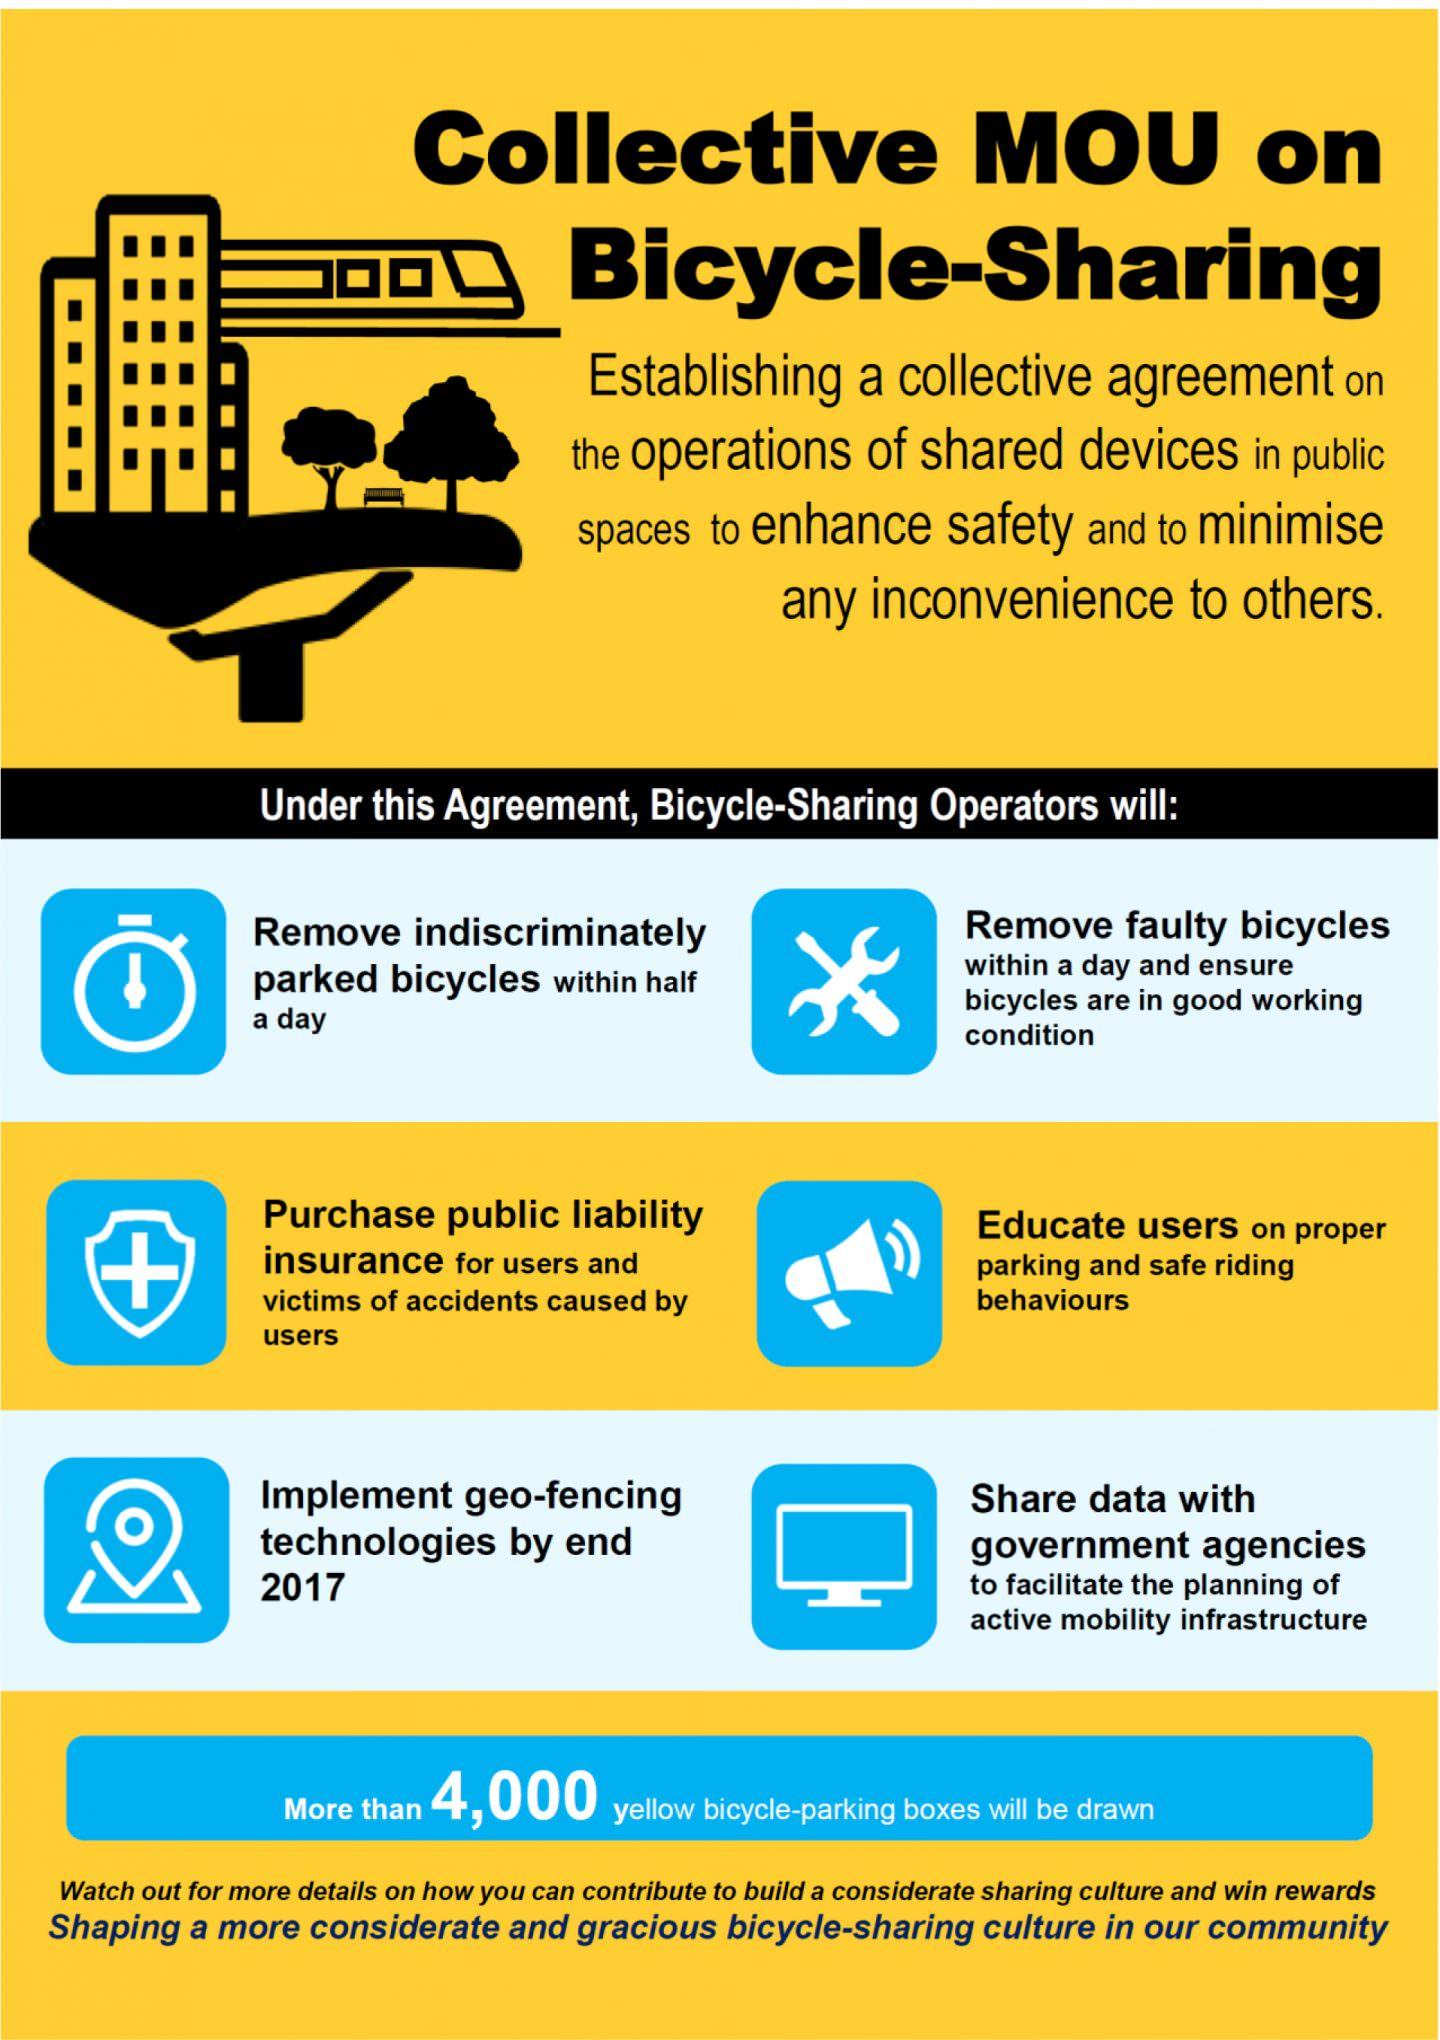 MoU Singapur Bikesharing Obike Ofo Mobike LTA Regeln stationslos